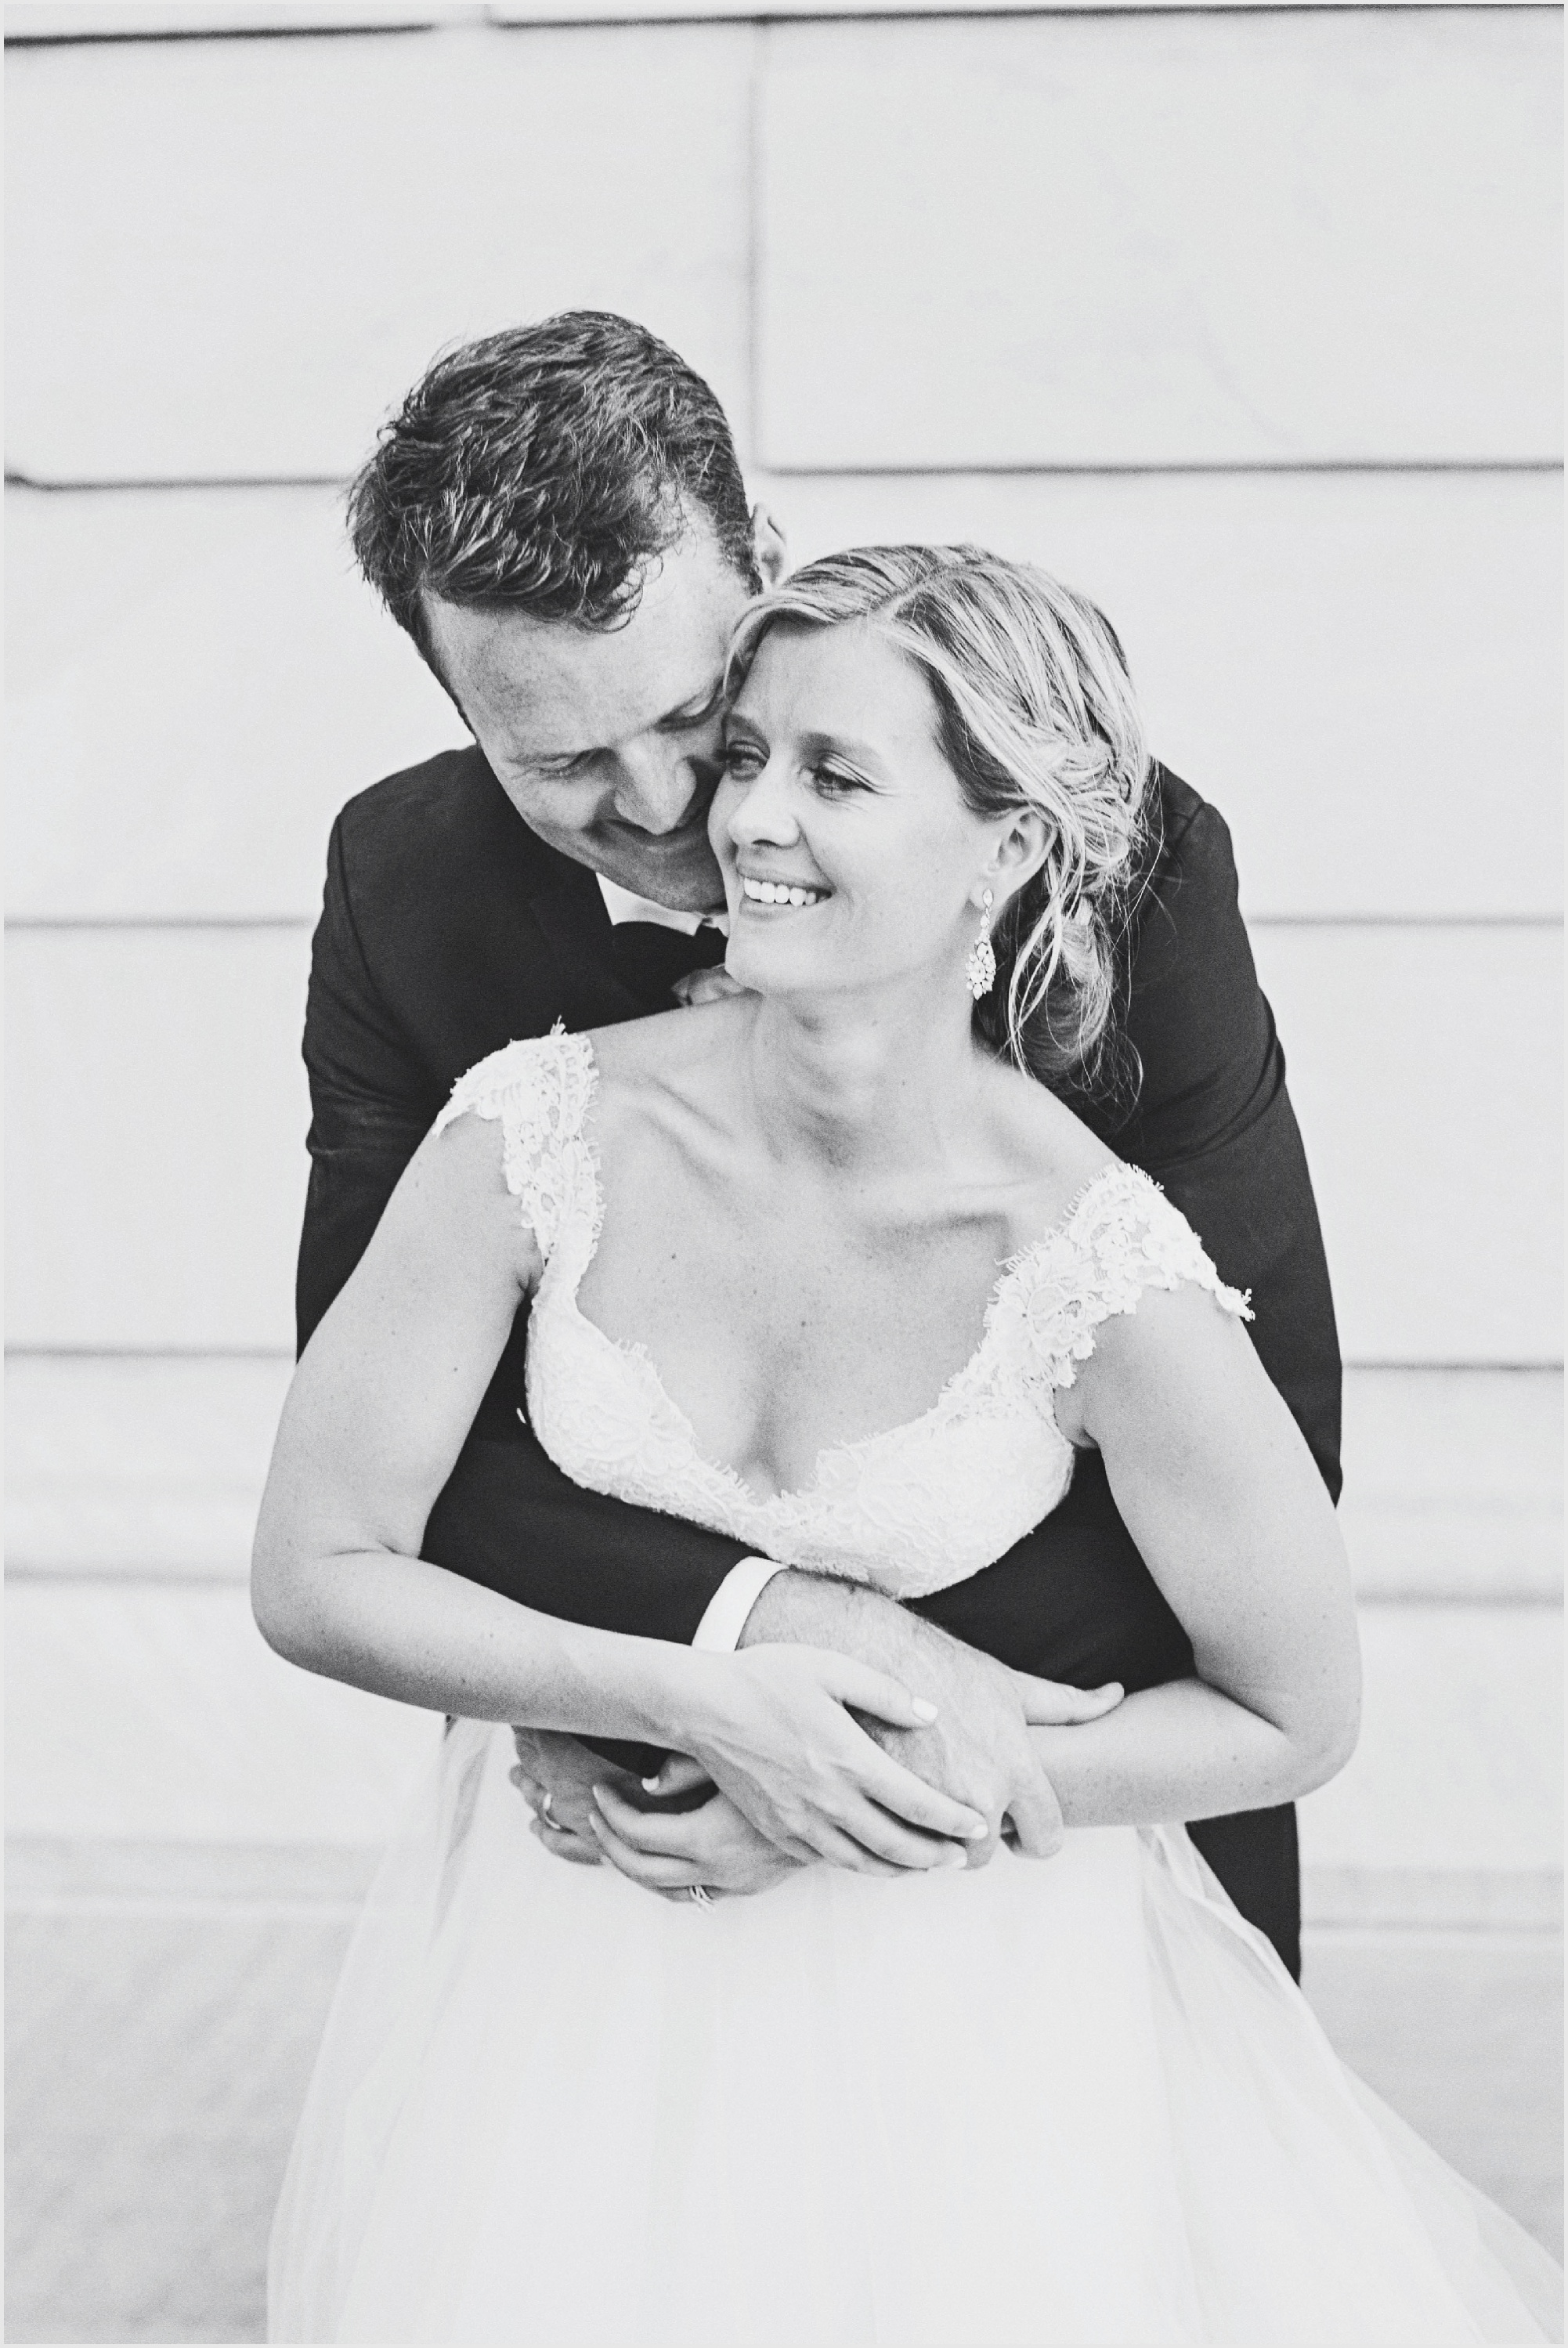 maura_david_james_j_hill_wedding_lucas_botz_photography_053.jpg